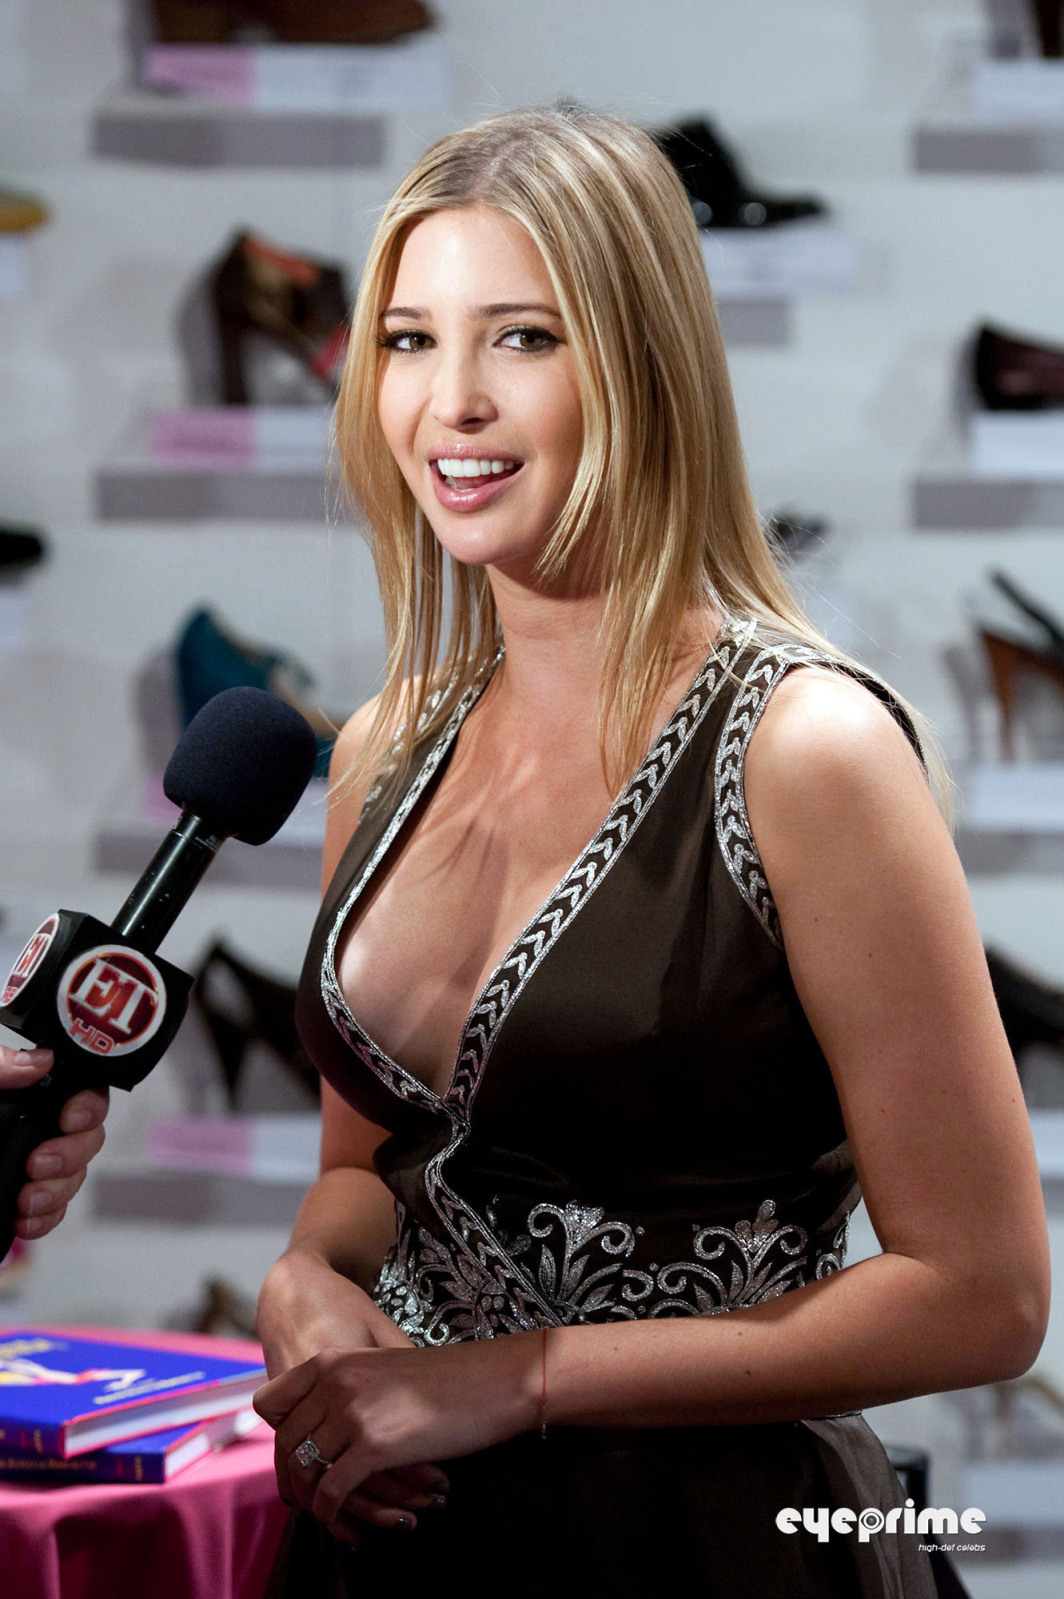 Wallpaper World: Sexy Ivanka Trump hot Cleavage wallpaper. Ivanka Trump